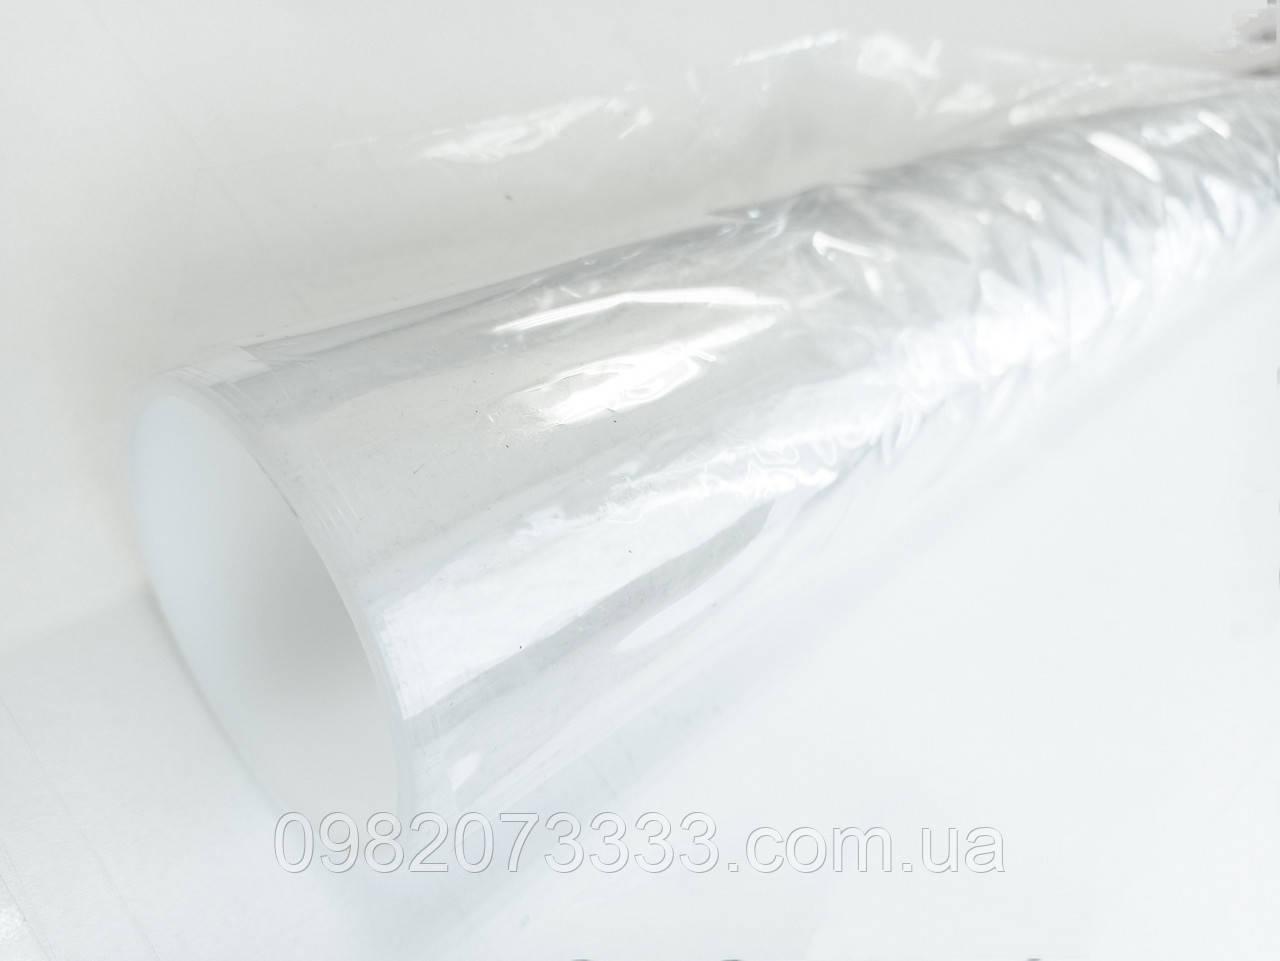 Пленка парниковая тепличная 50мкм (ширина 0,6м, длина 20 и 30м, можно отрез)